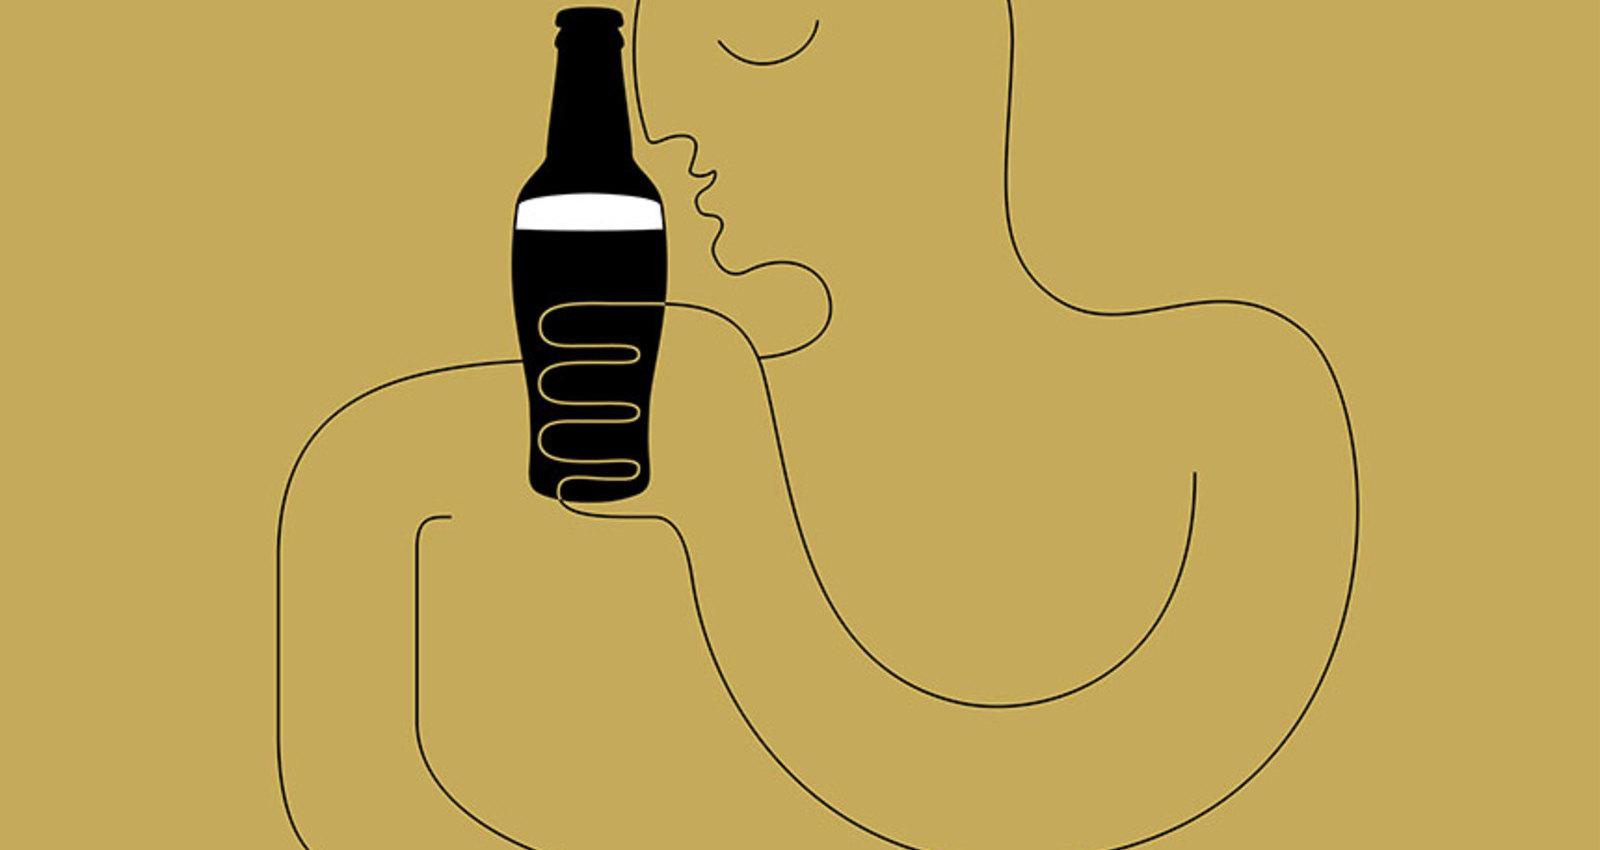 Guinness Draught in a Bottle